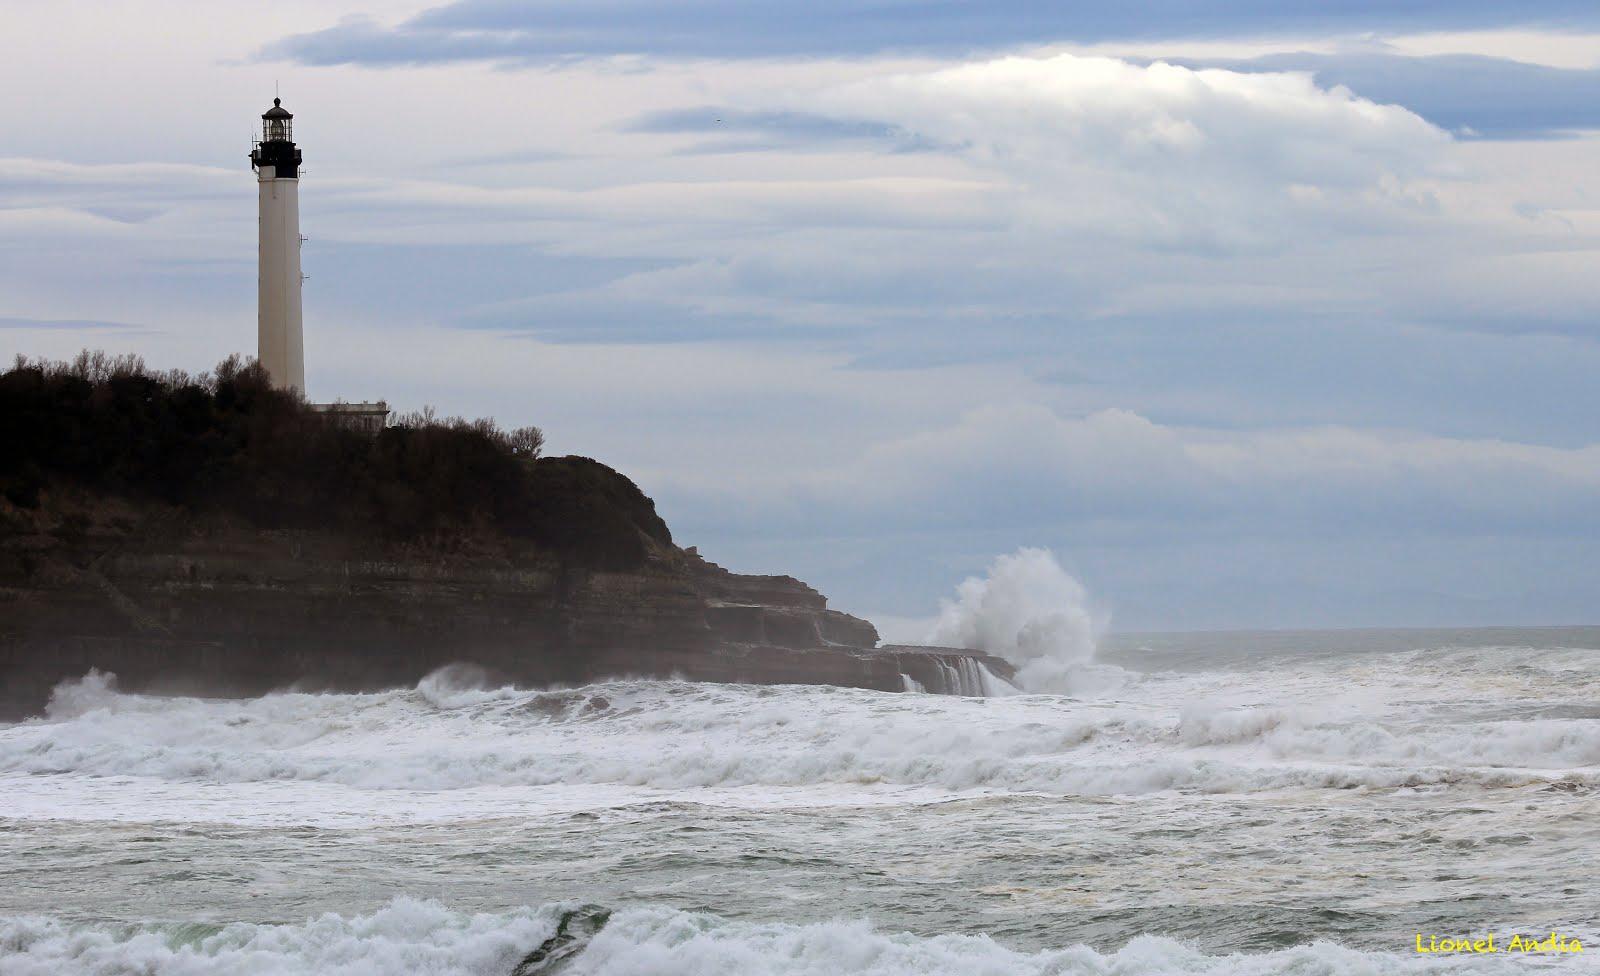 Pays basque aujourd 39 hui le phare de biarritz - Phare de biarritz ...